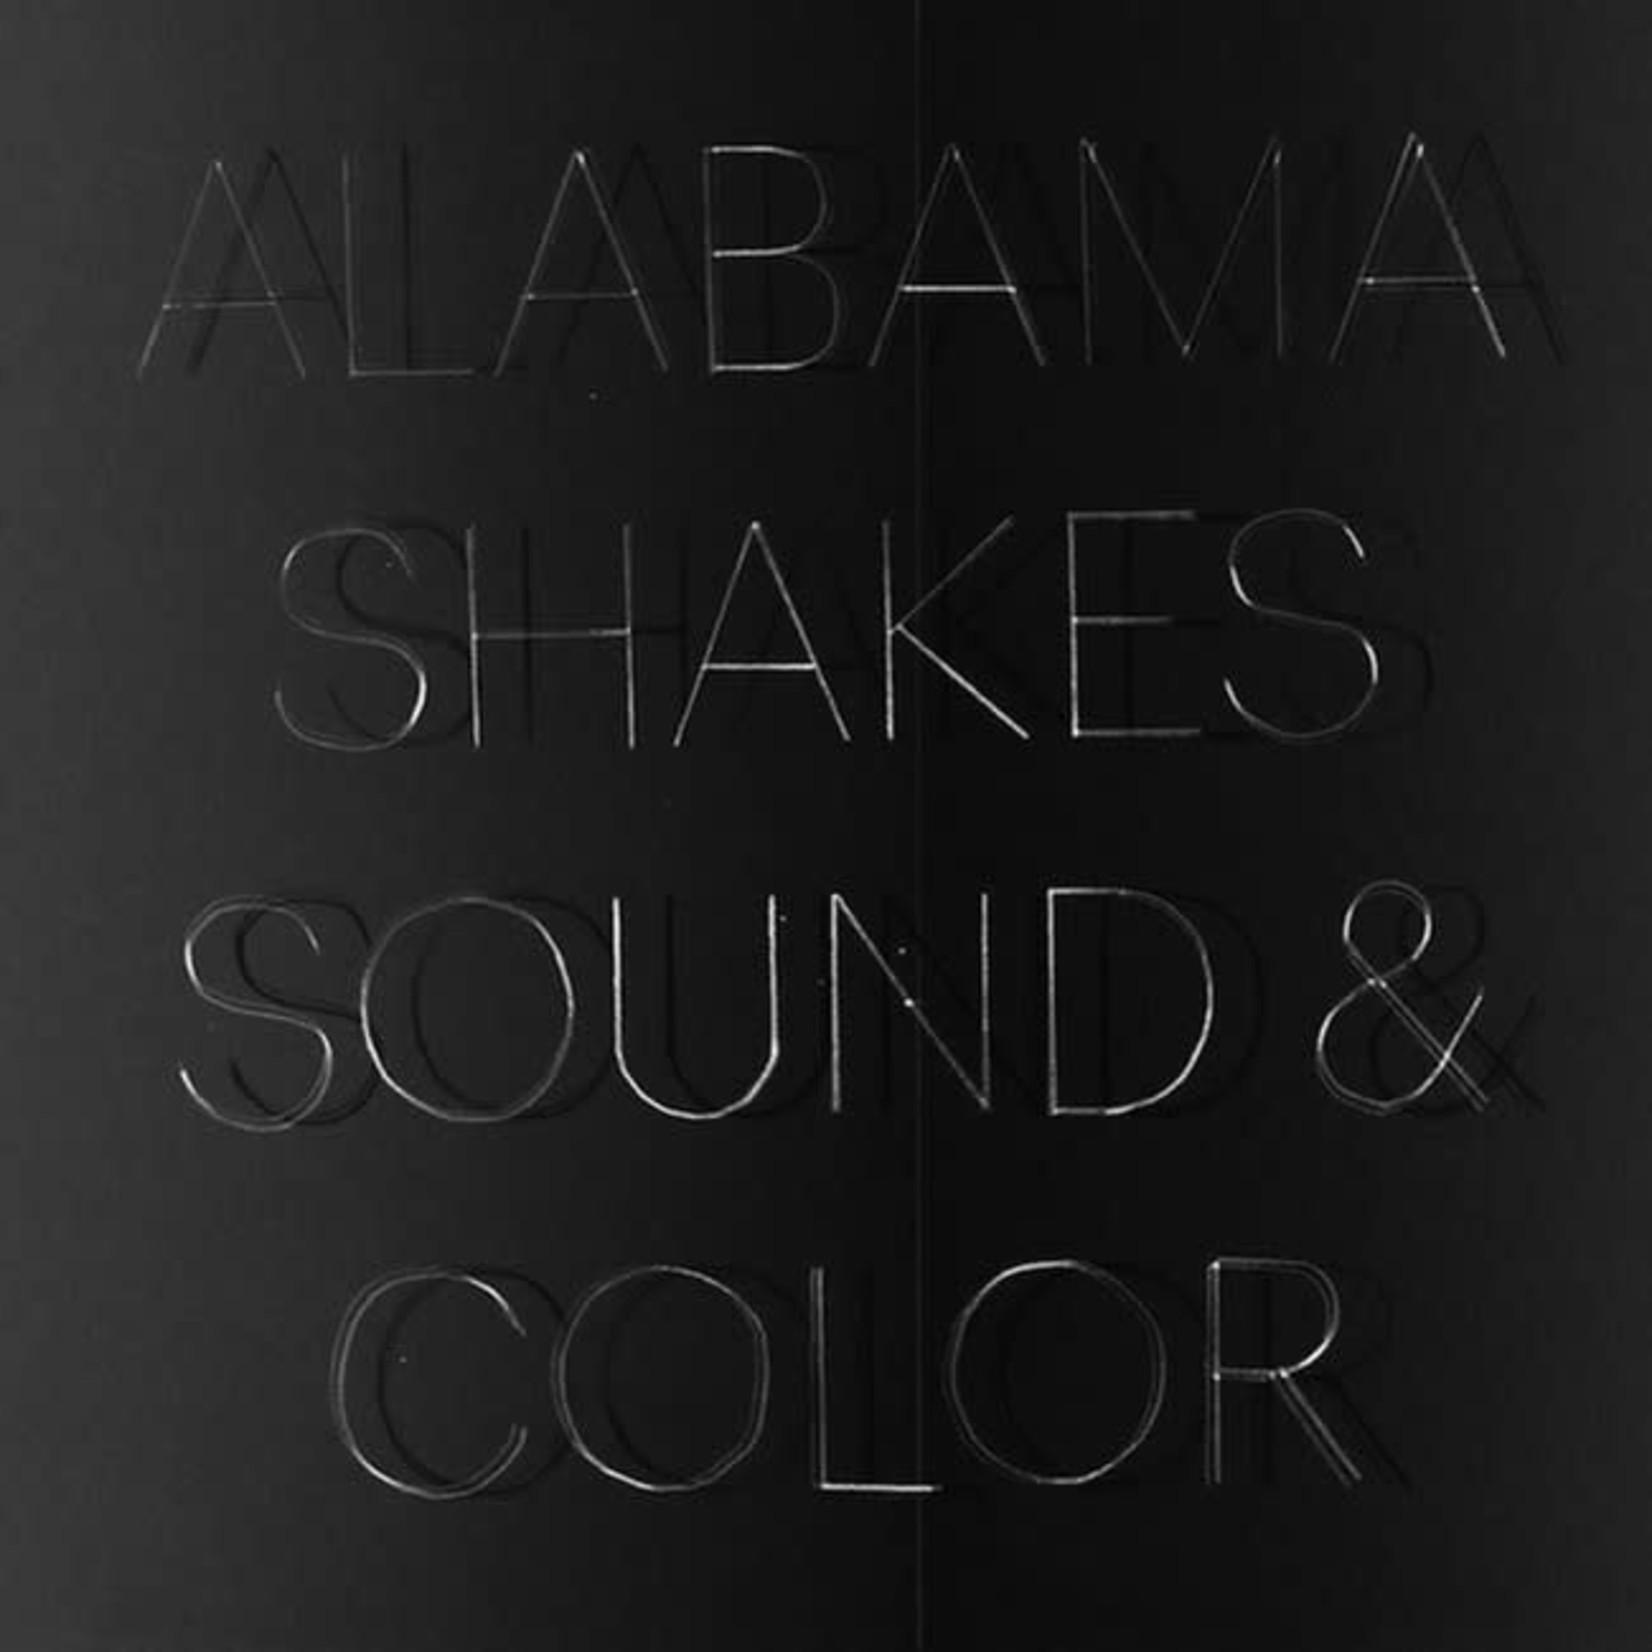 [New] Alabama Shakes: Sound & Color (2LP, clear vinyl)